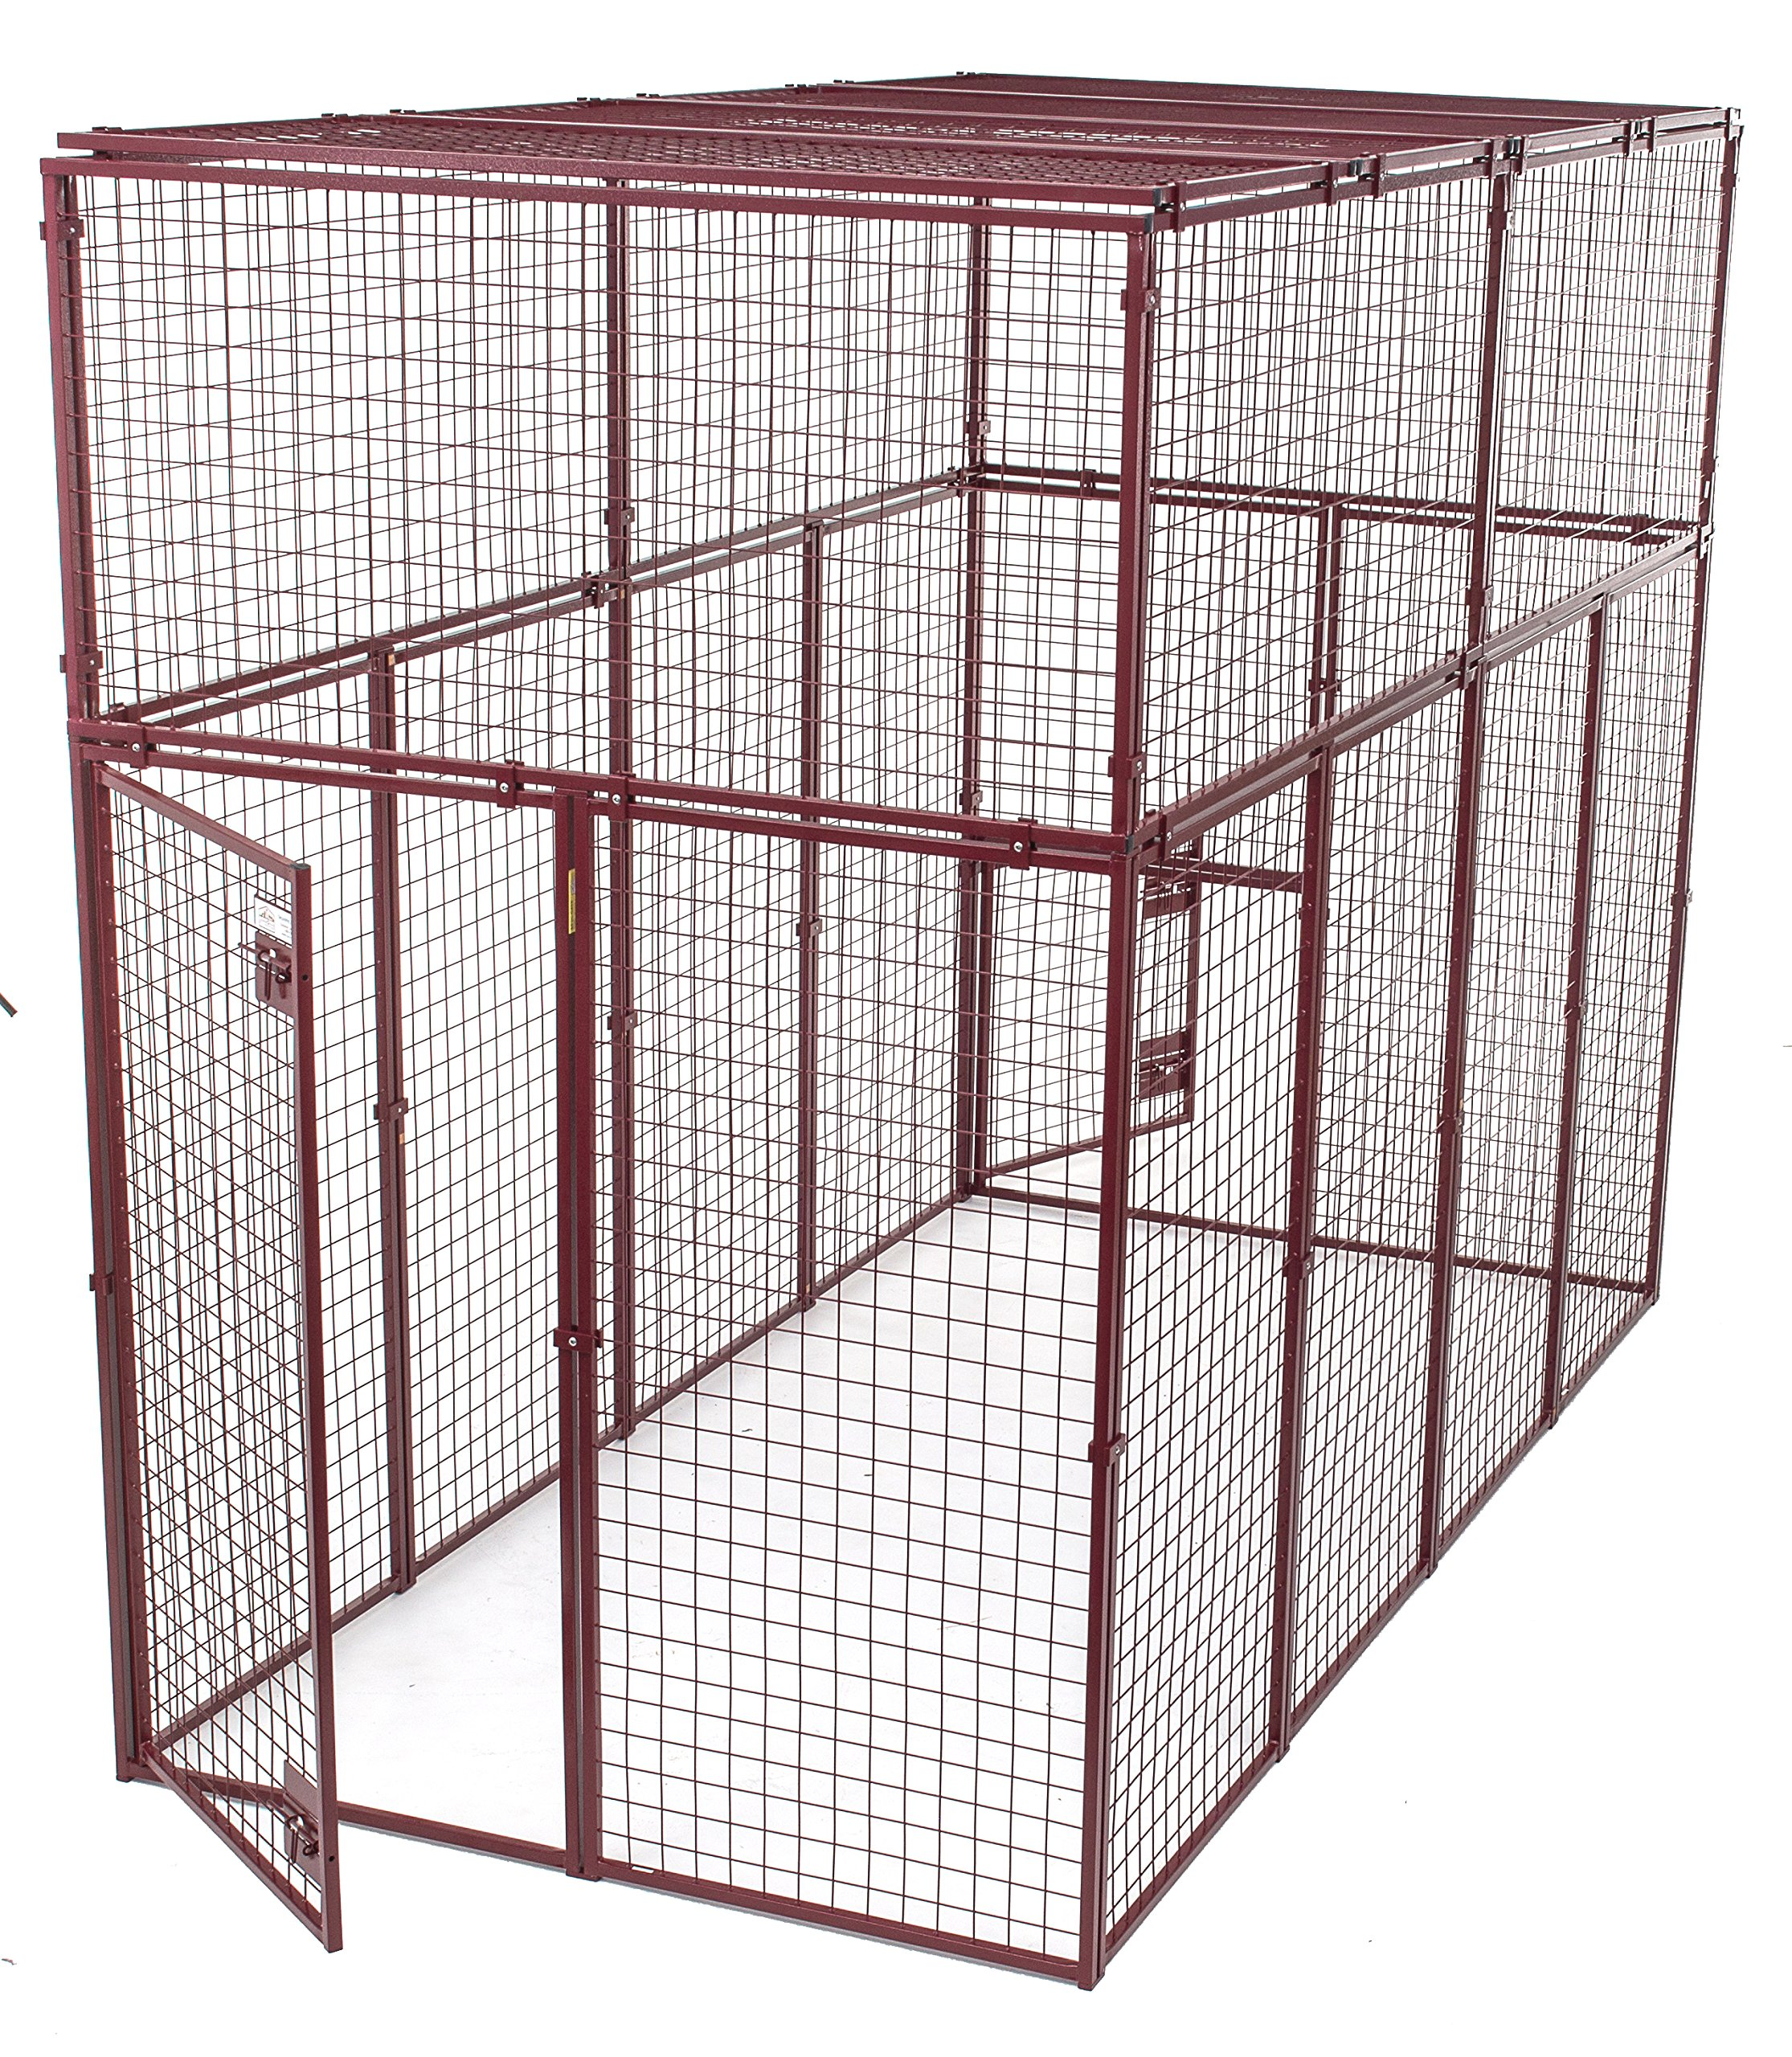 Animal House Heavy Duty Modular Pet Kennel (7.5' Hx10'Lx5'W) 244.2 lbs